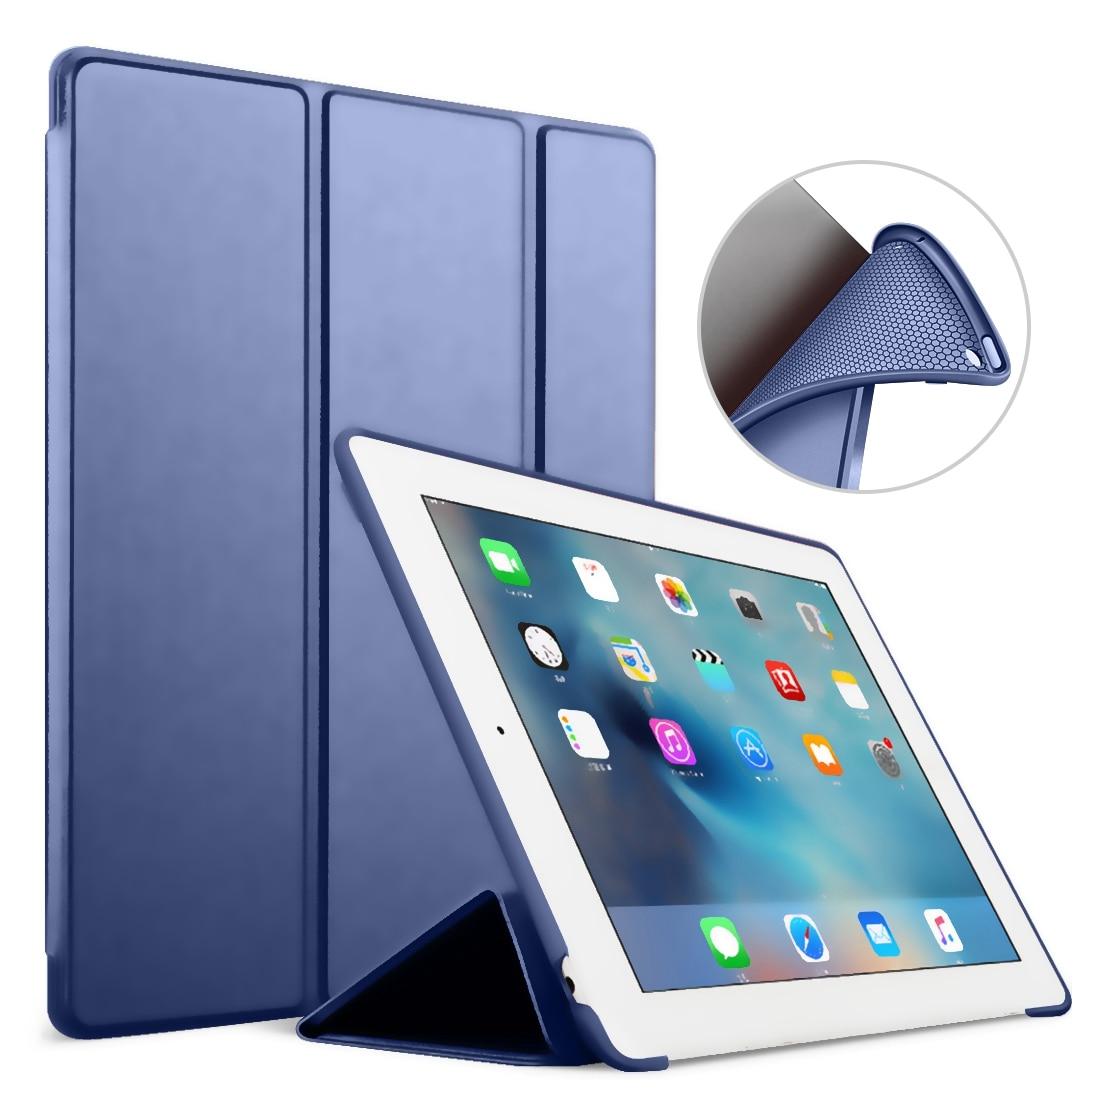 все цены на  For Apple iPad 2 3 4 Case,Silicone Smart Cover Soft TPU Case PU Leather Flip Stand Auto Sleep/Wake The Tablets  онлайн